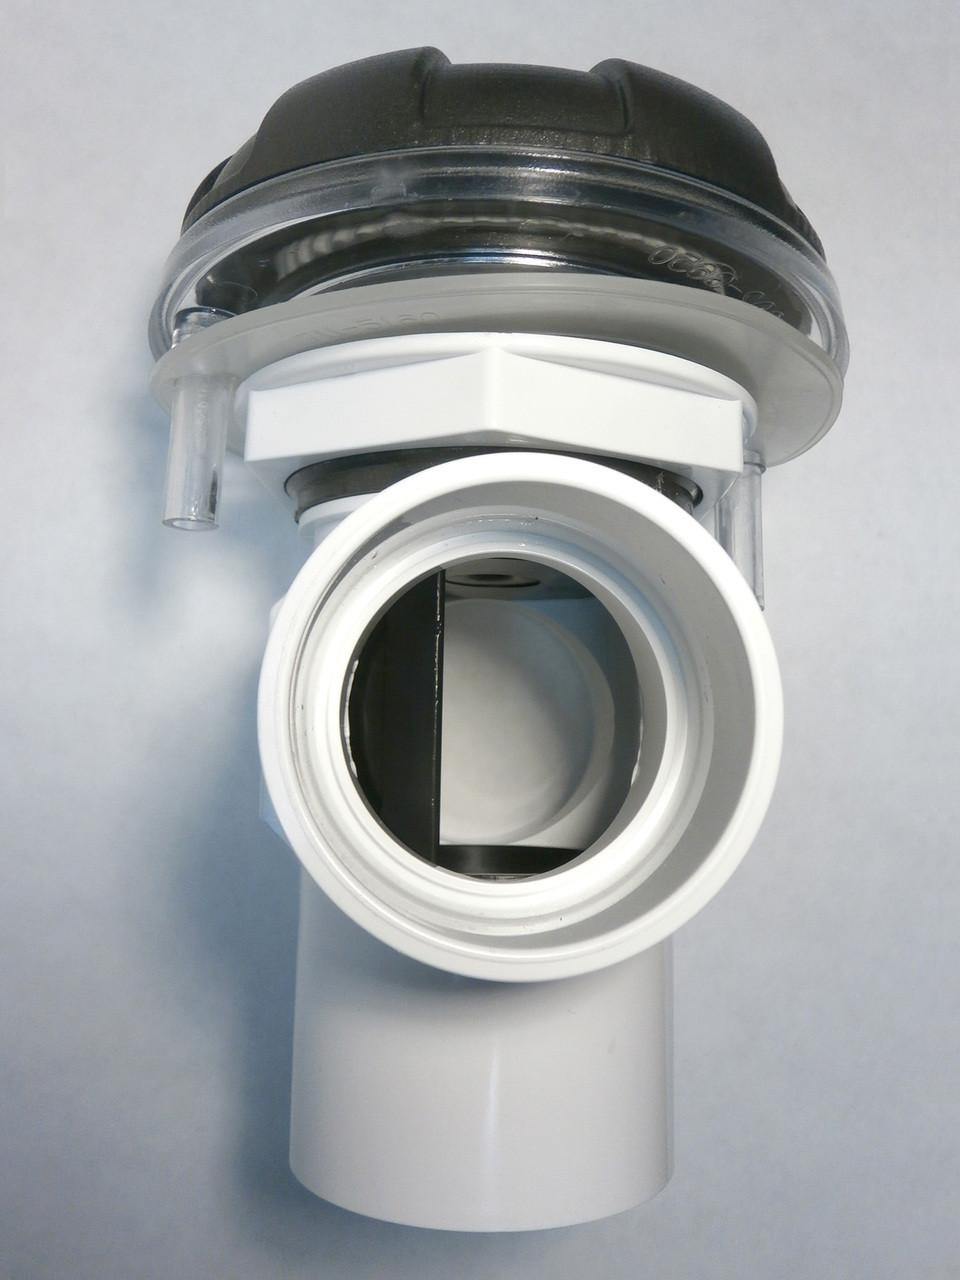 Master Spa - X245375 - 2 inch DSG 6-Spoke Diverter Assembly Starting 2009 - Side View